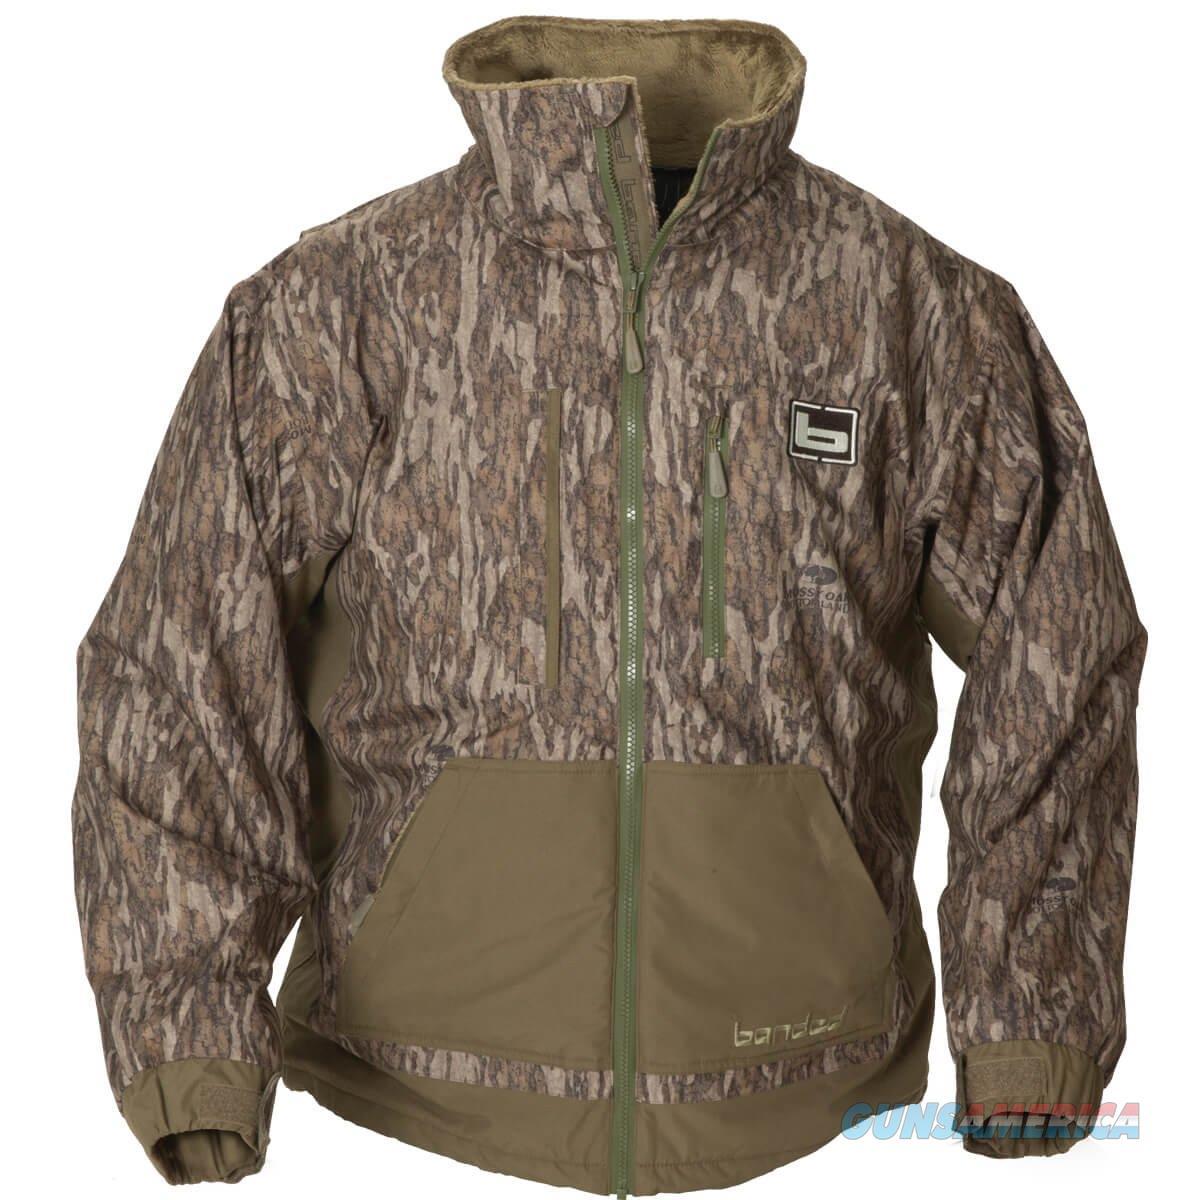 Banded Chesapeake Pullover Bottomland MD  Non-Guns > Shotgun Sports > Vests/Jackets